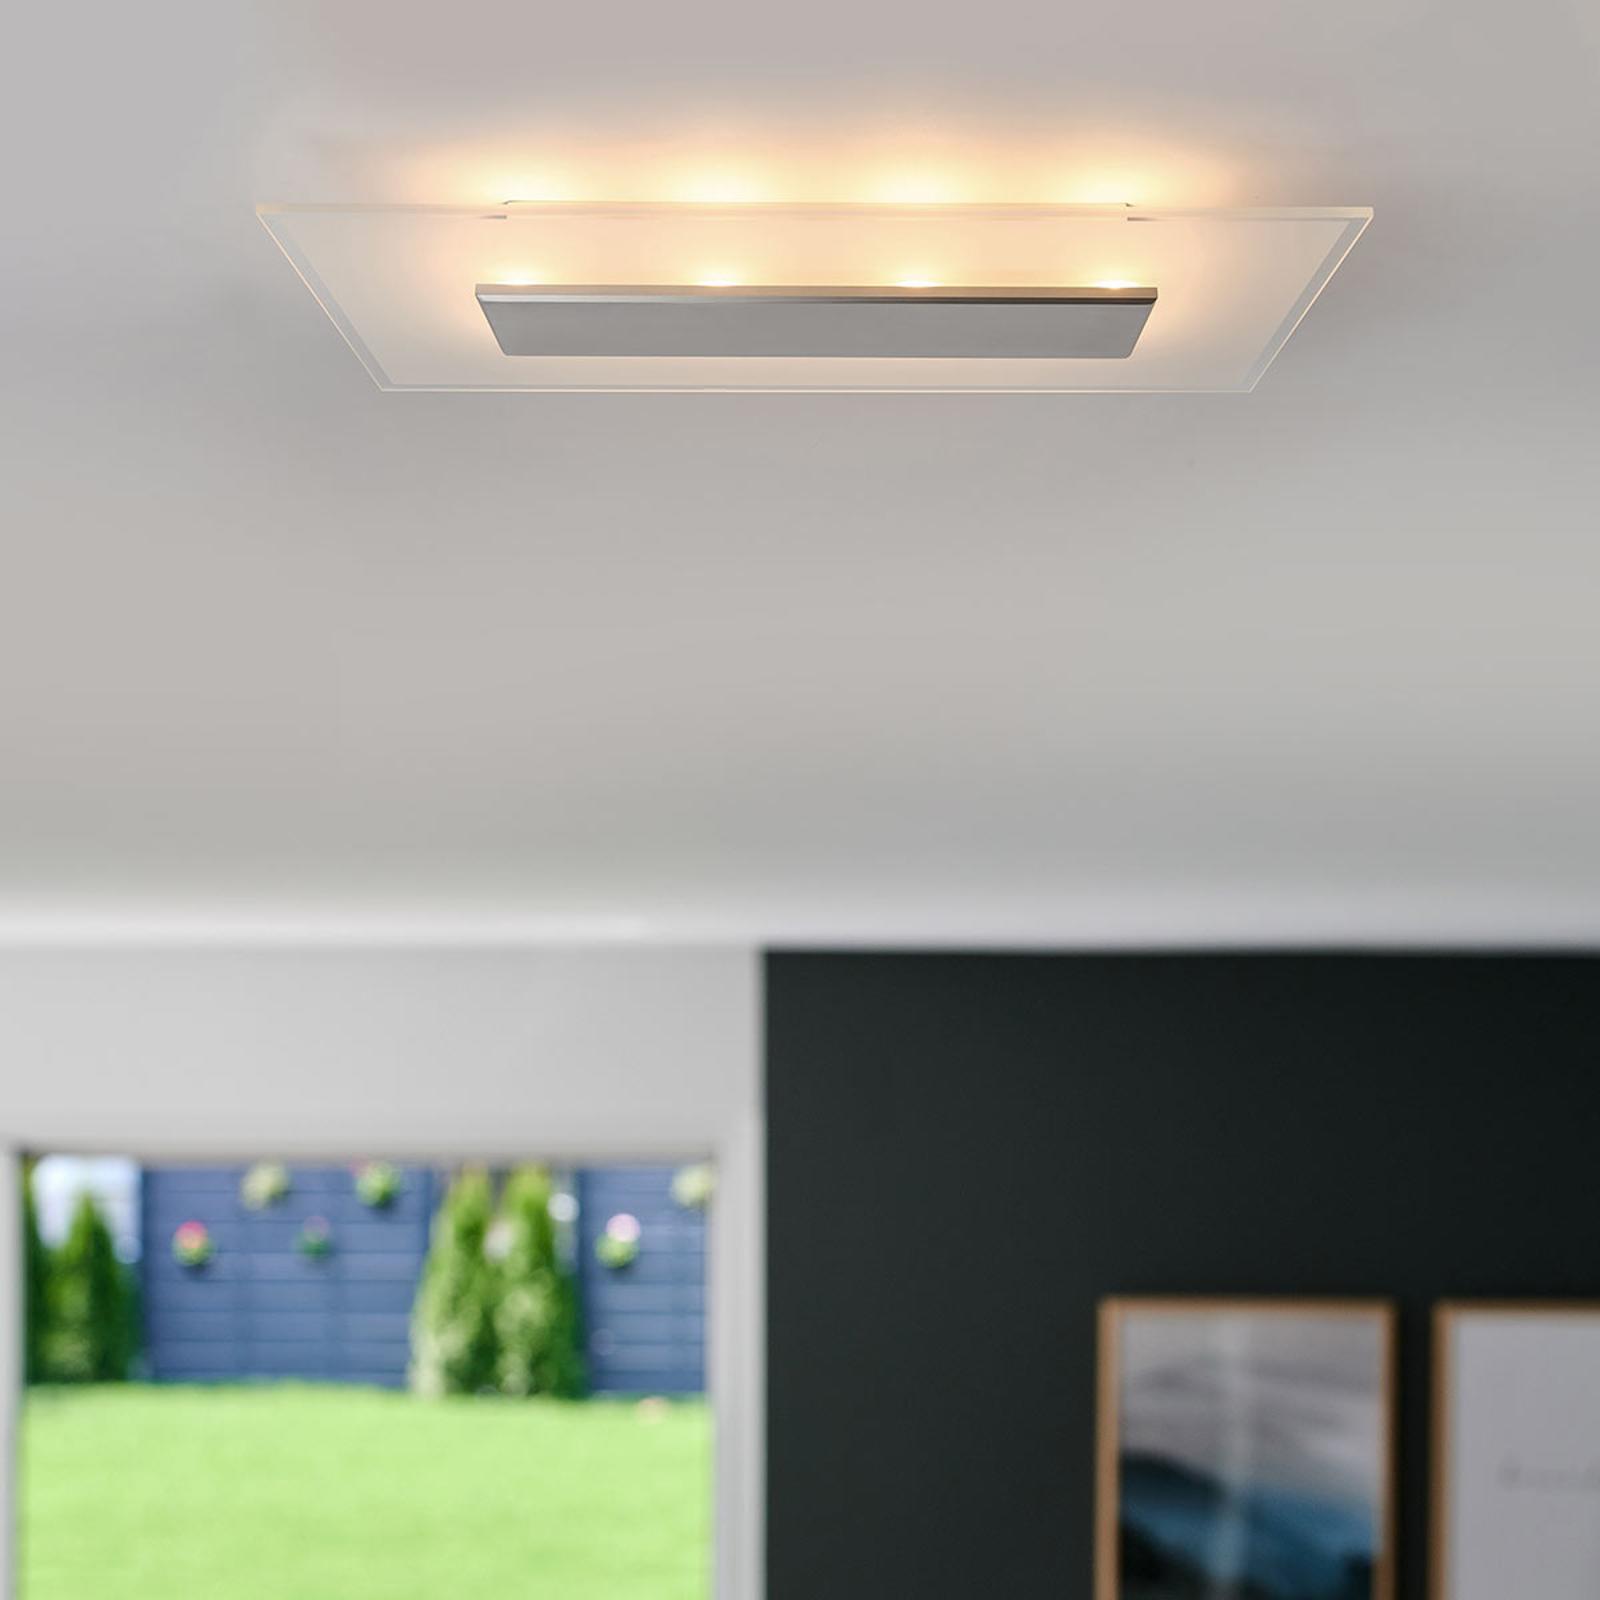 LED plafondlamp Lole met glazen kap, 29 cm